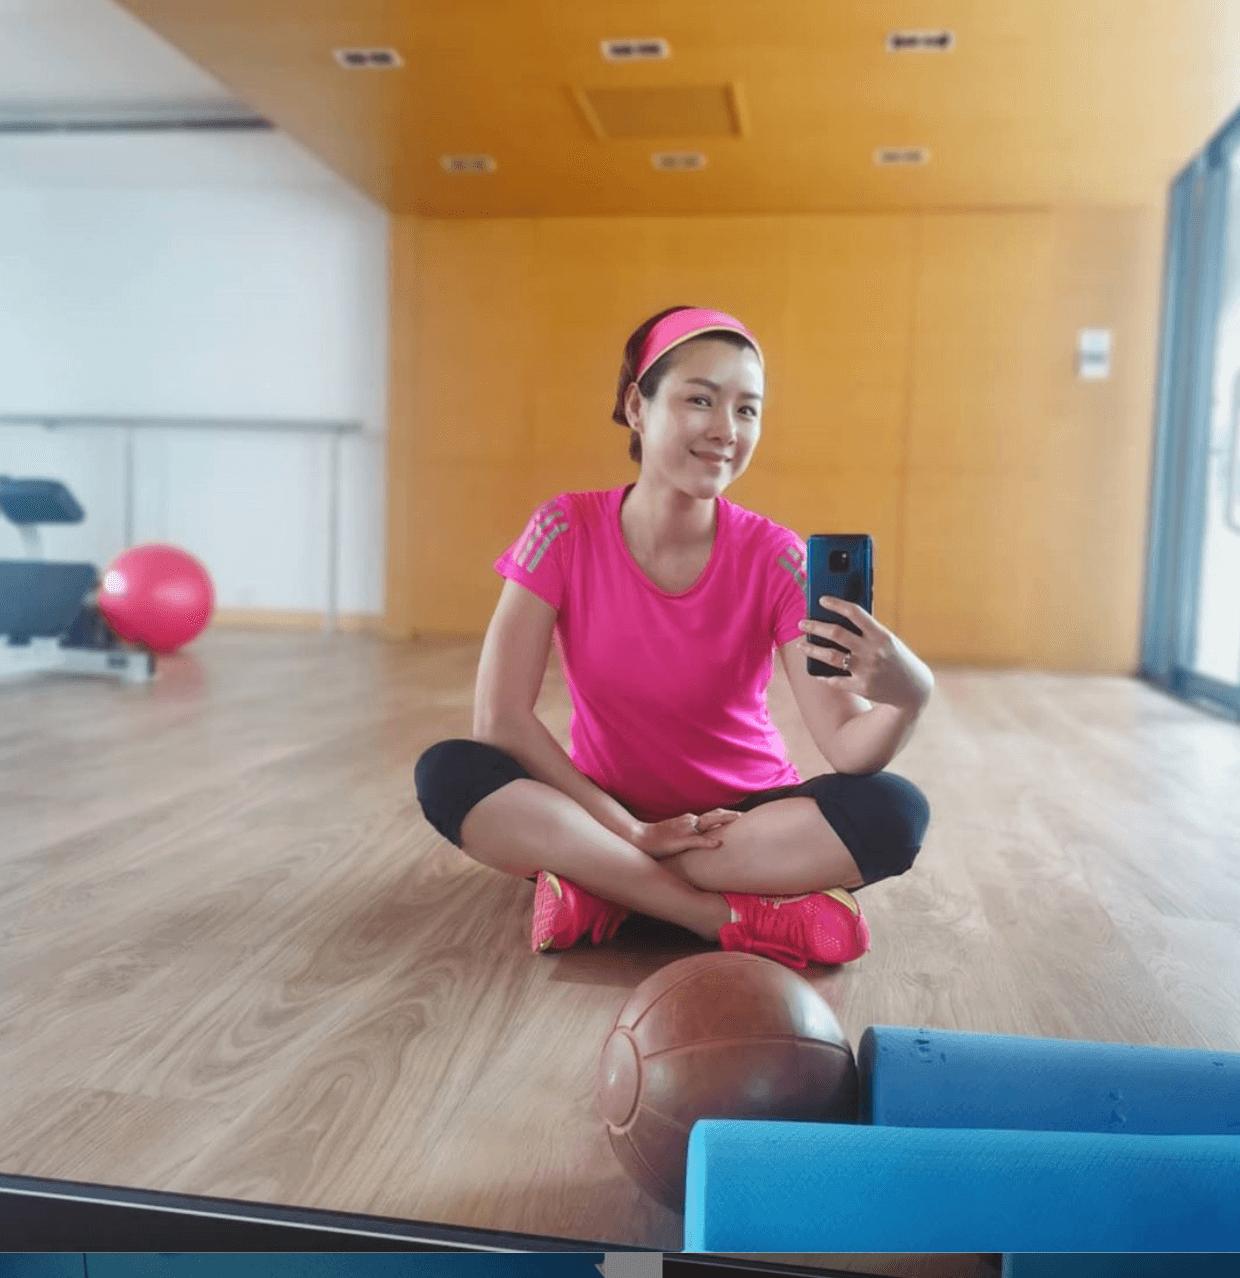 Aimee經常做Gym保持弗爆身材